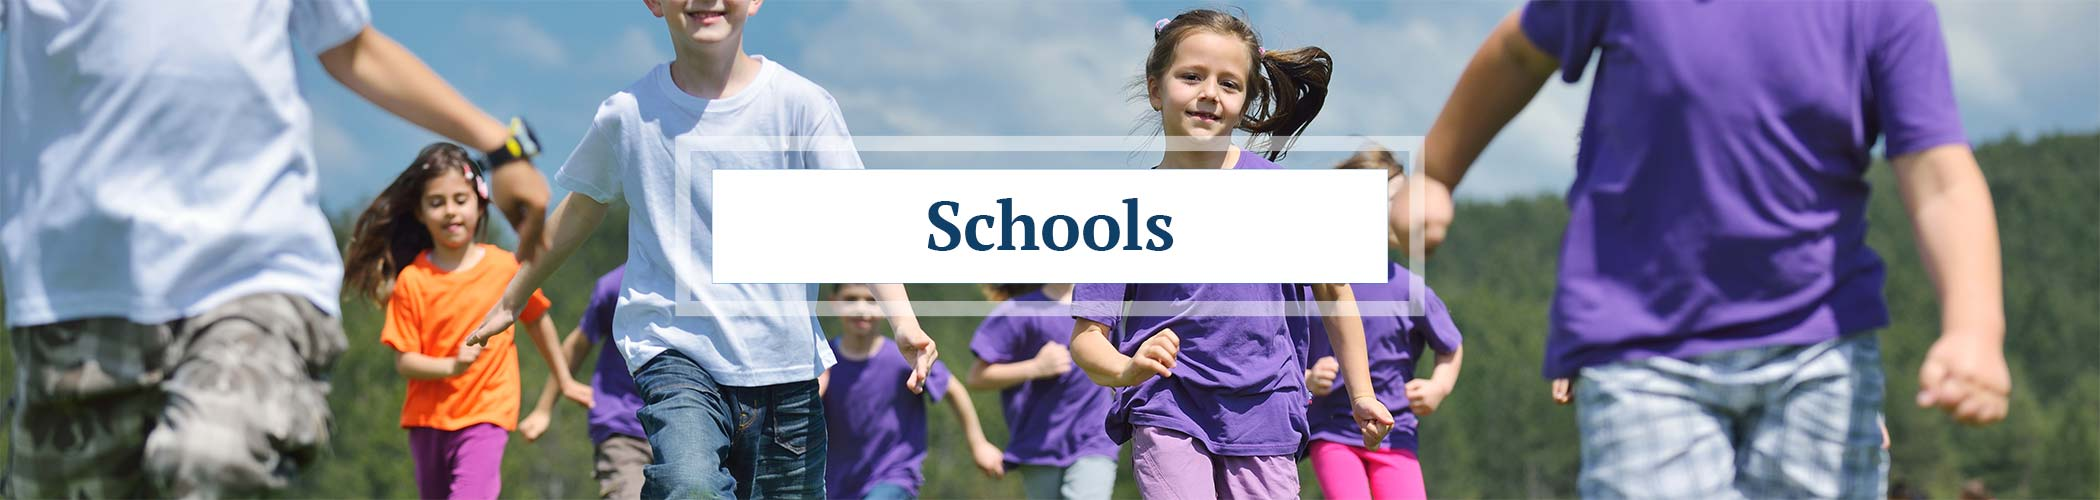 schools virtual running